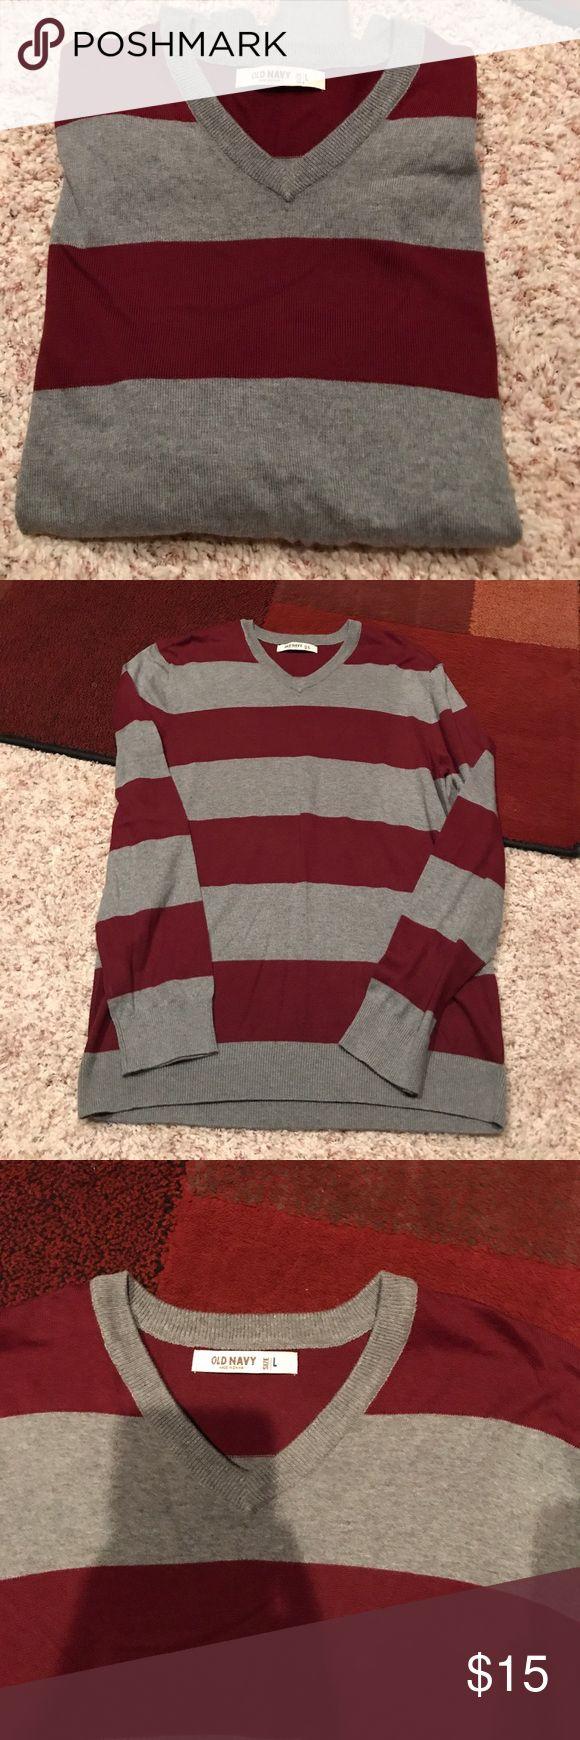 Men's v neck sweater Men's Old Navy maroon and gray striped V-neck sweater size large Old Navy Sweaters V-Neck